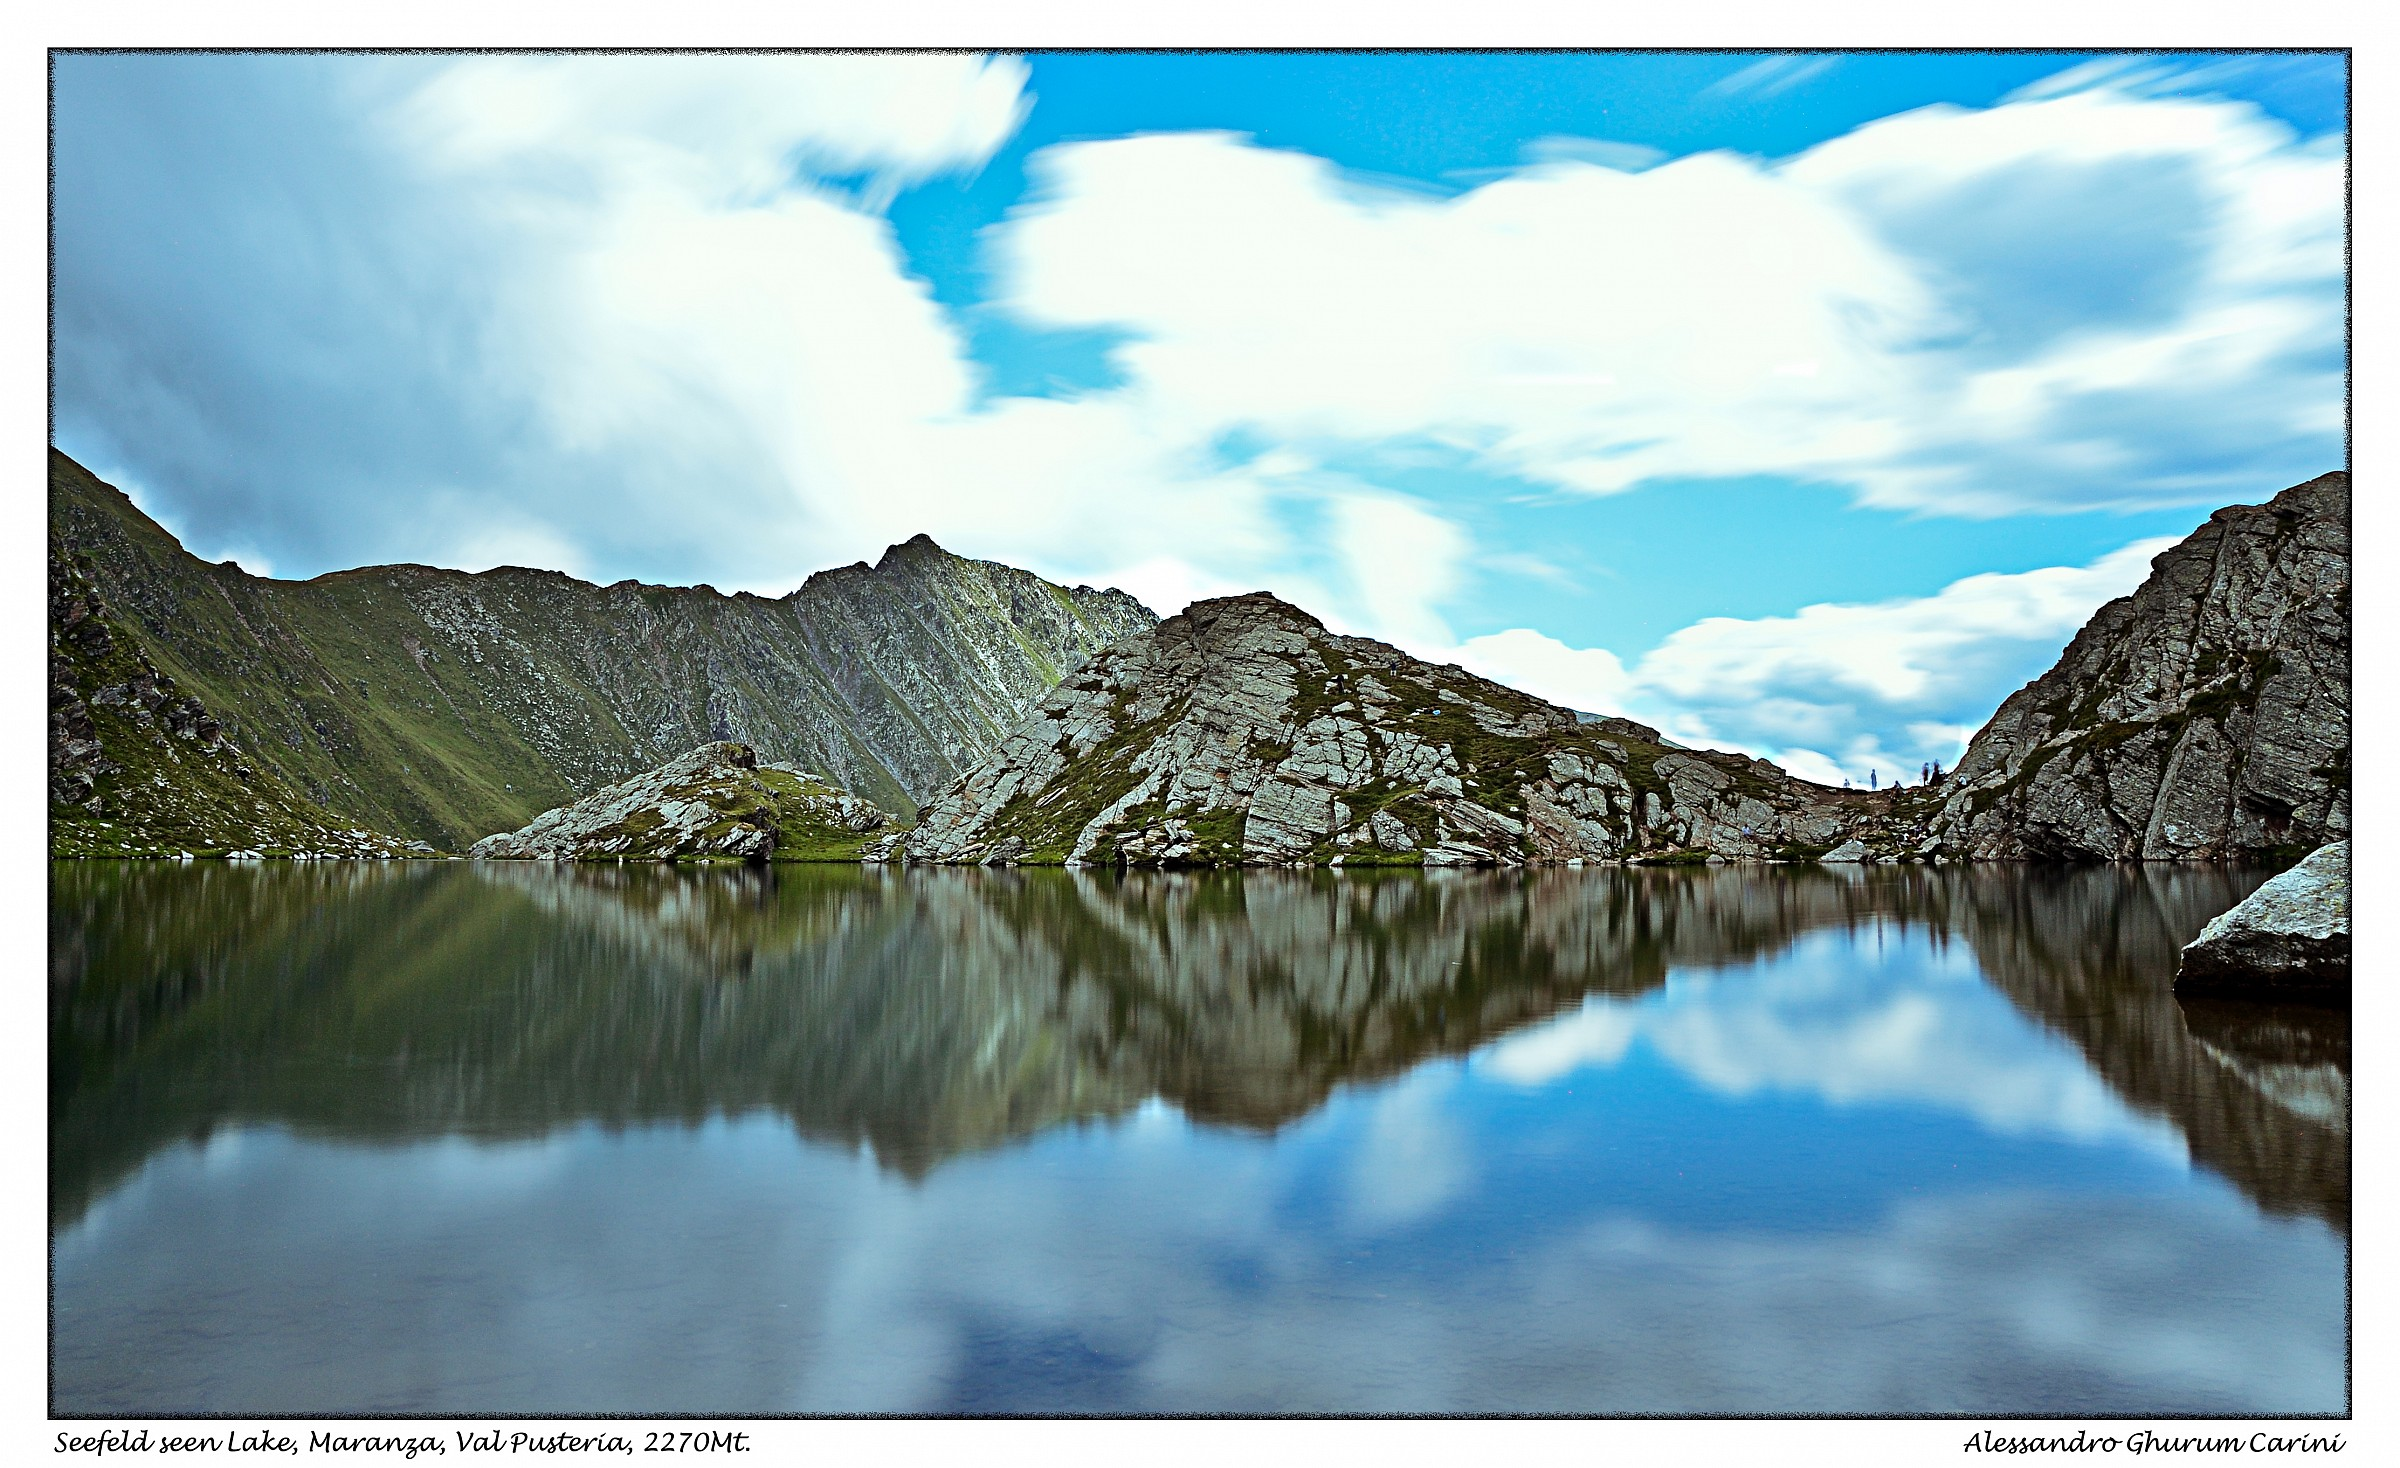 Seefeld Seen, Maranza, Val Pusteria, 2270Mt....